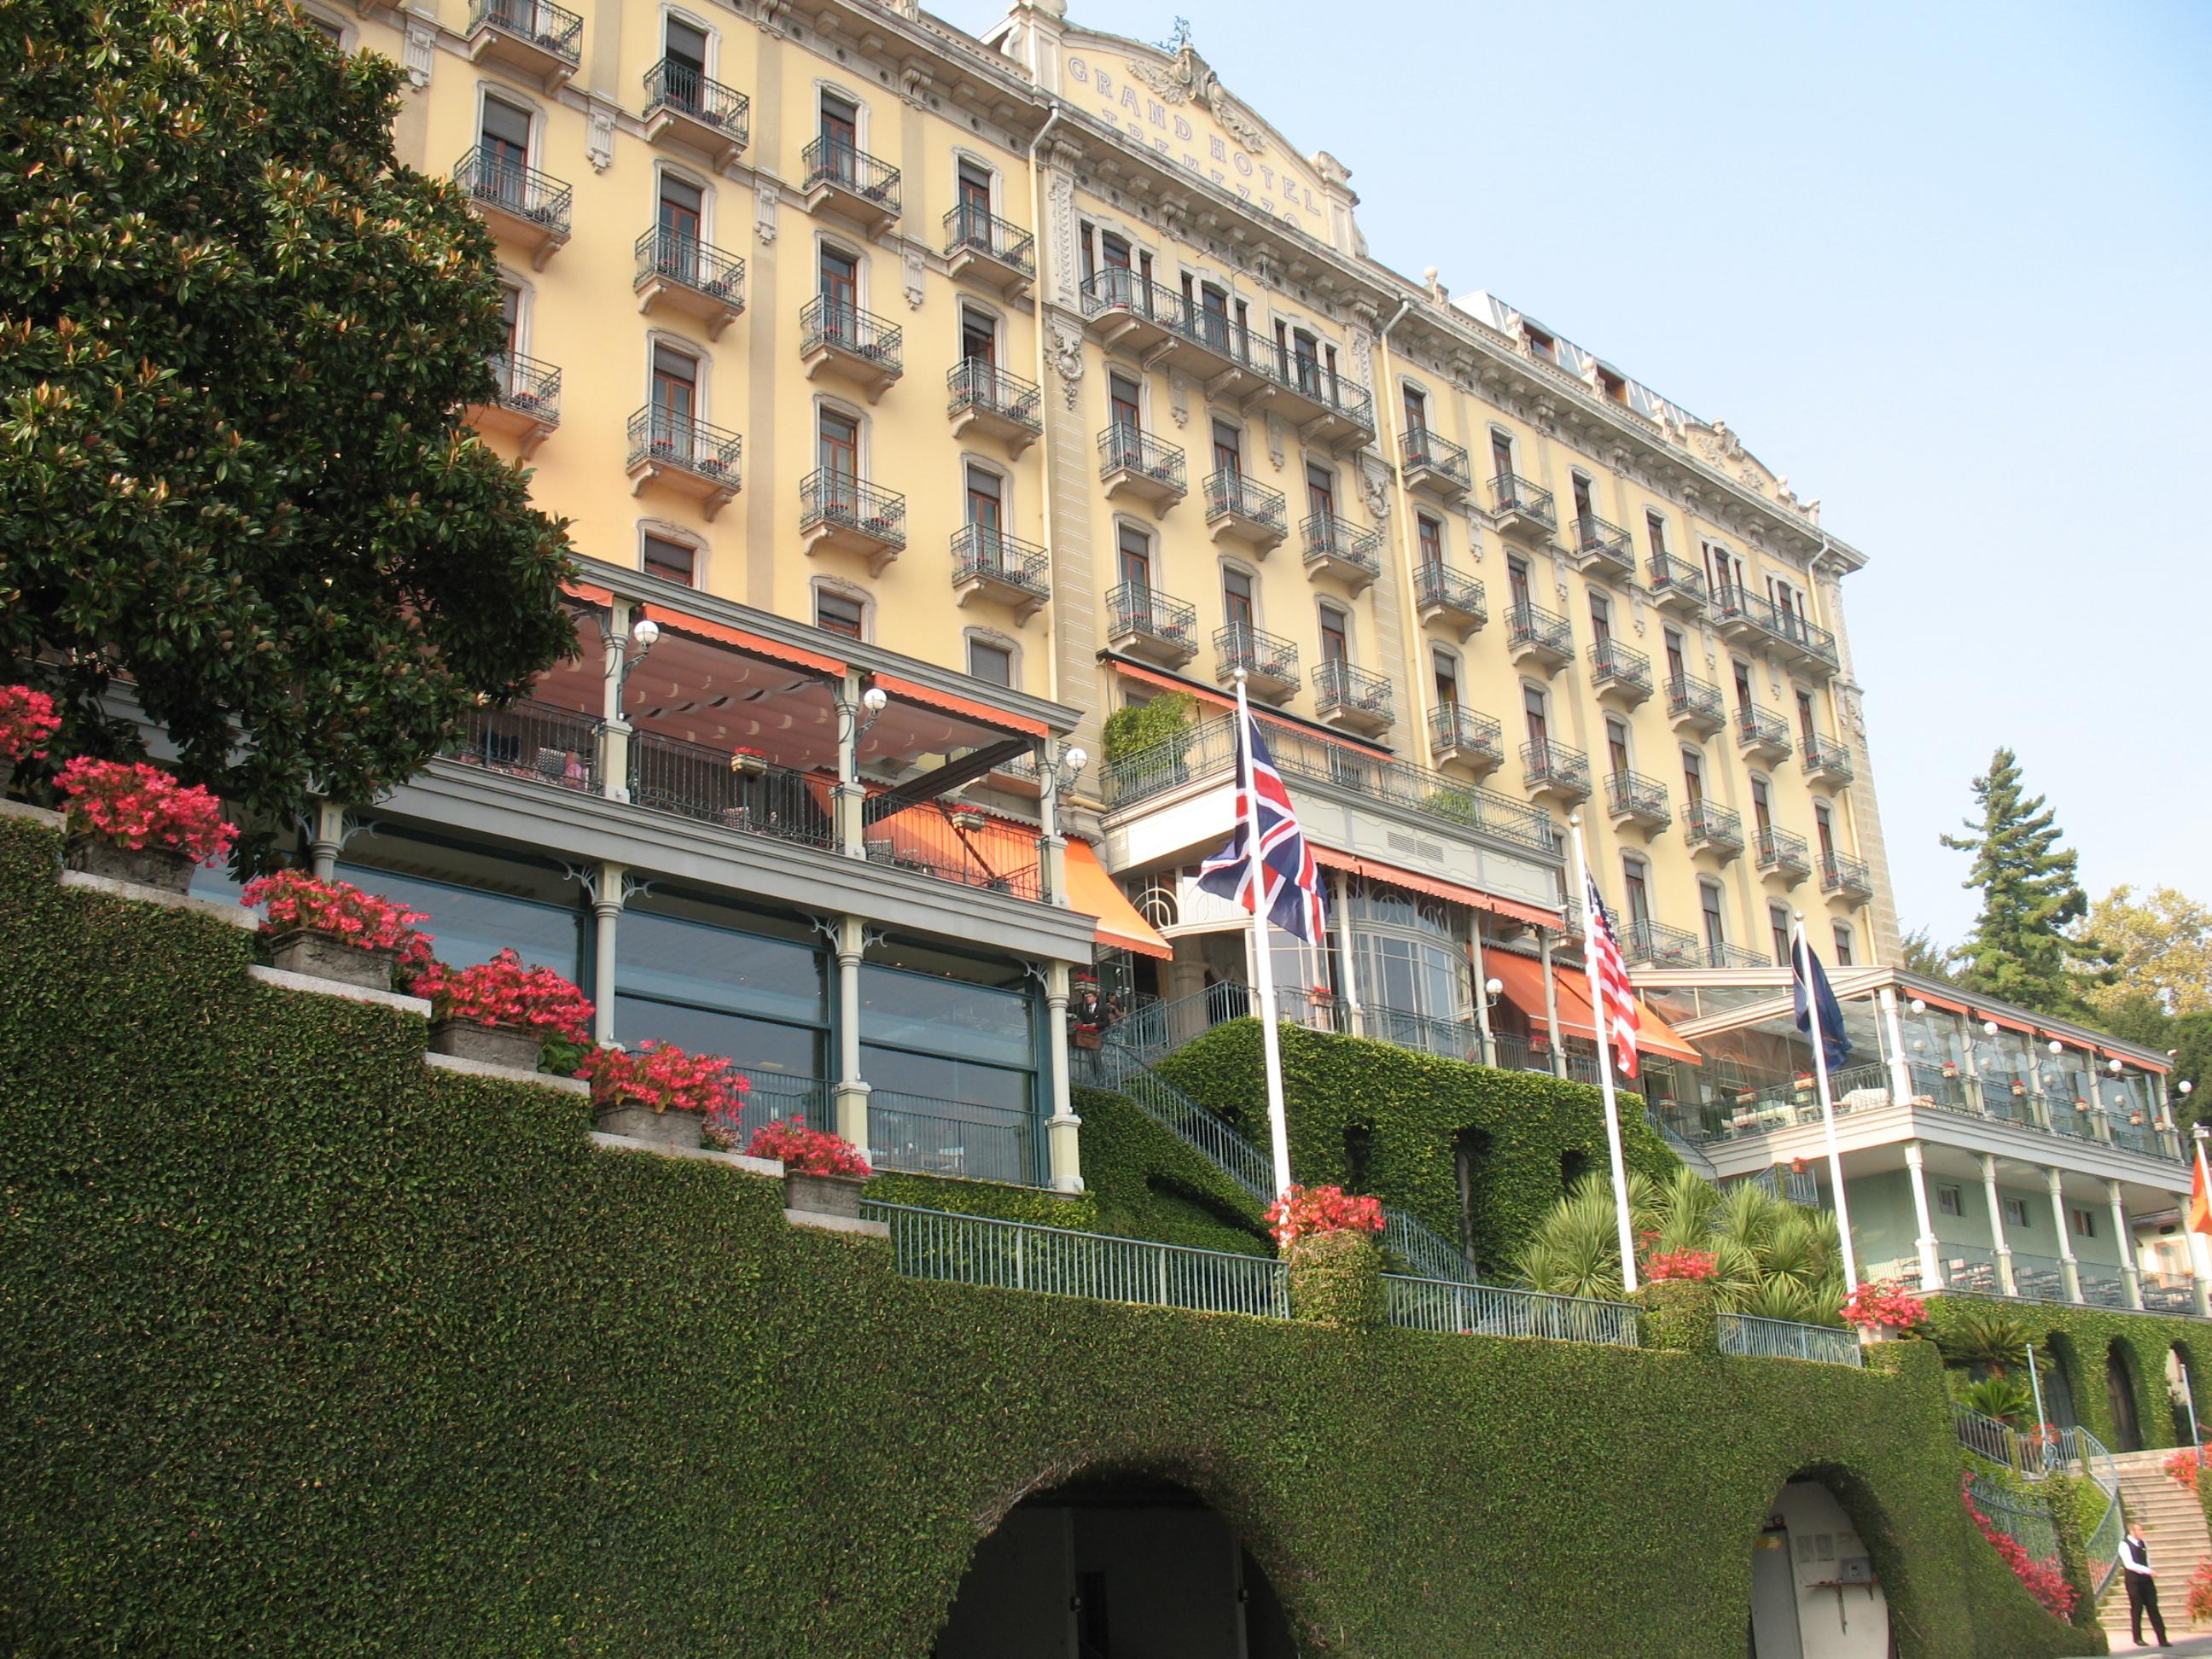 «Гранд Отель», Тремеццо, озеро Комо